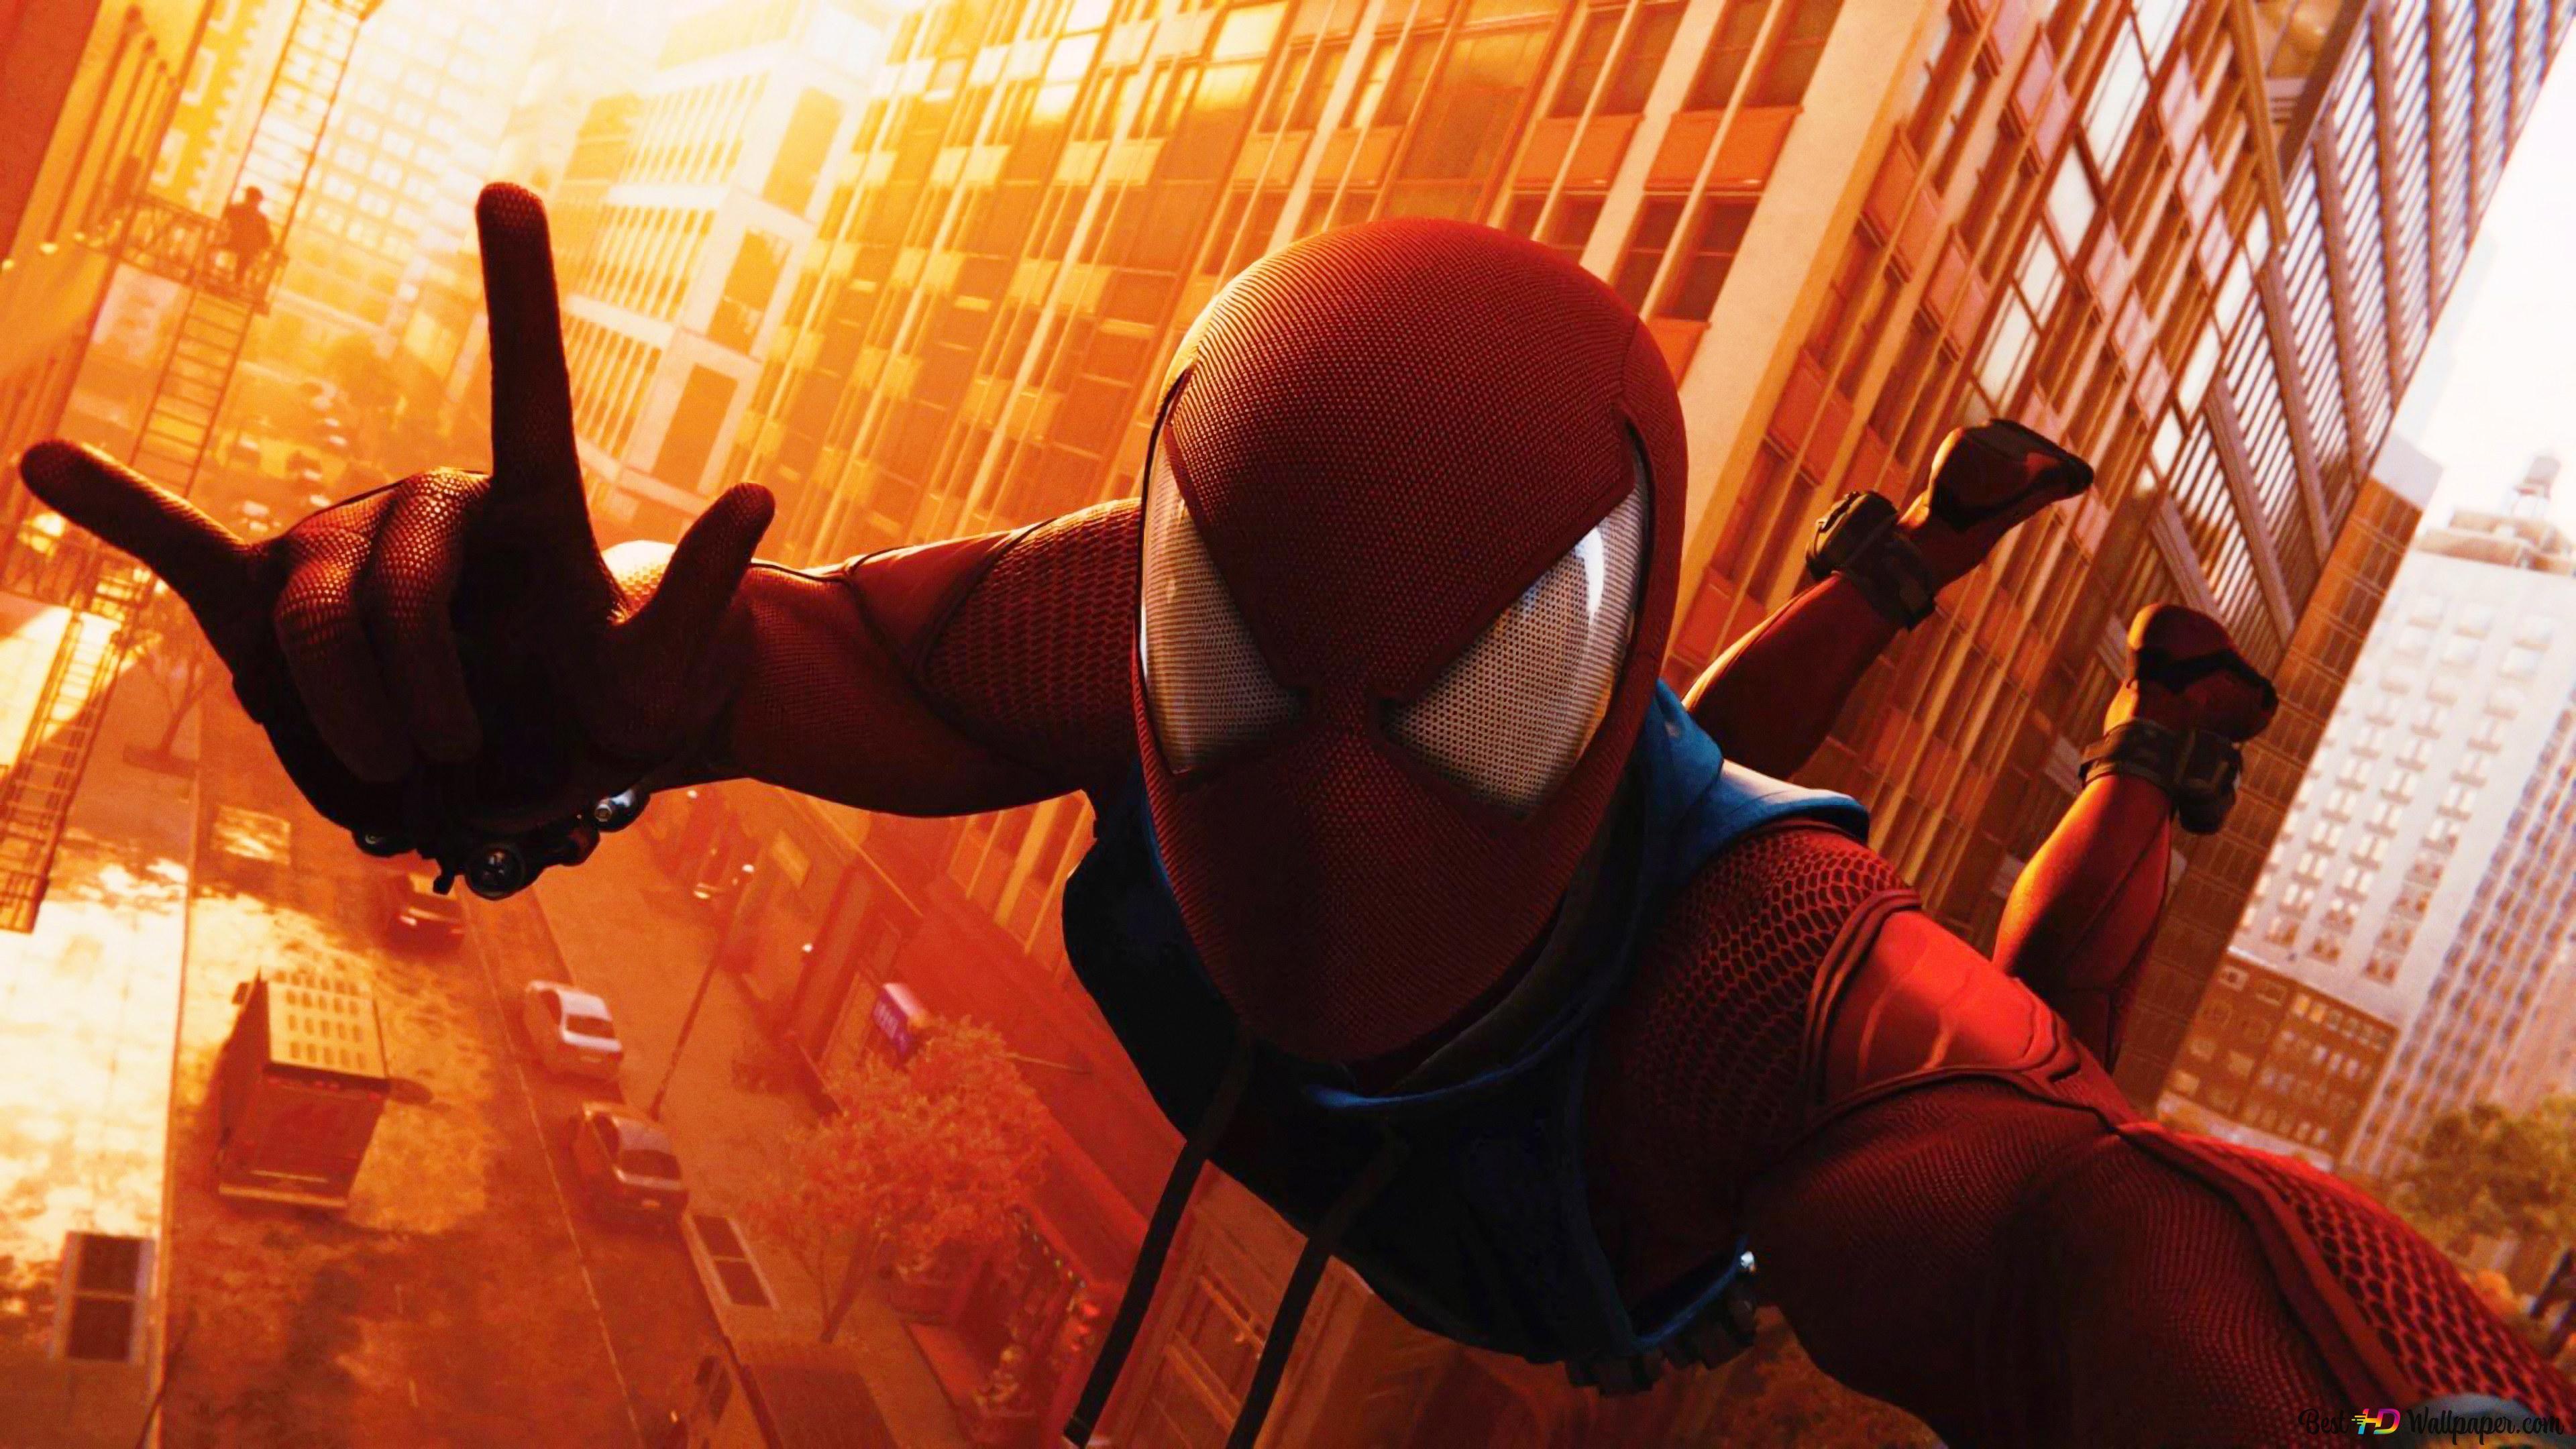 Permainan Spider Man Spidey Sejuk Mengambil Gambar Diri